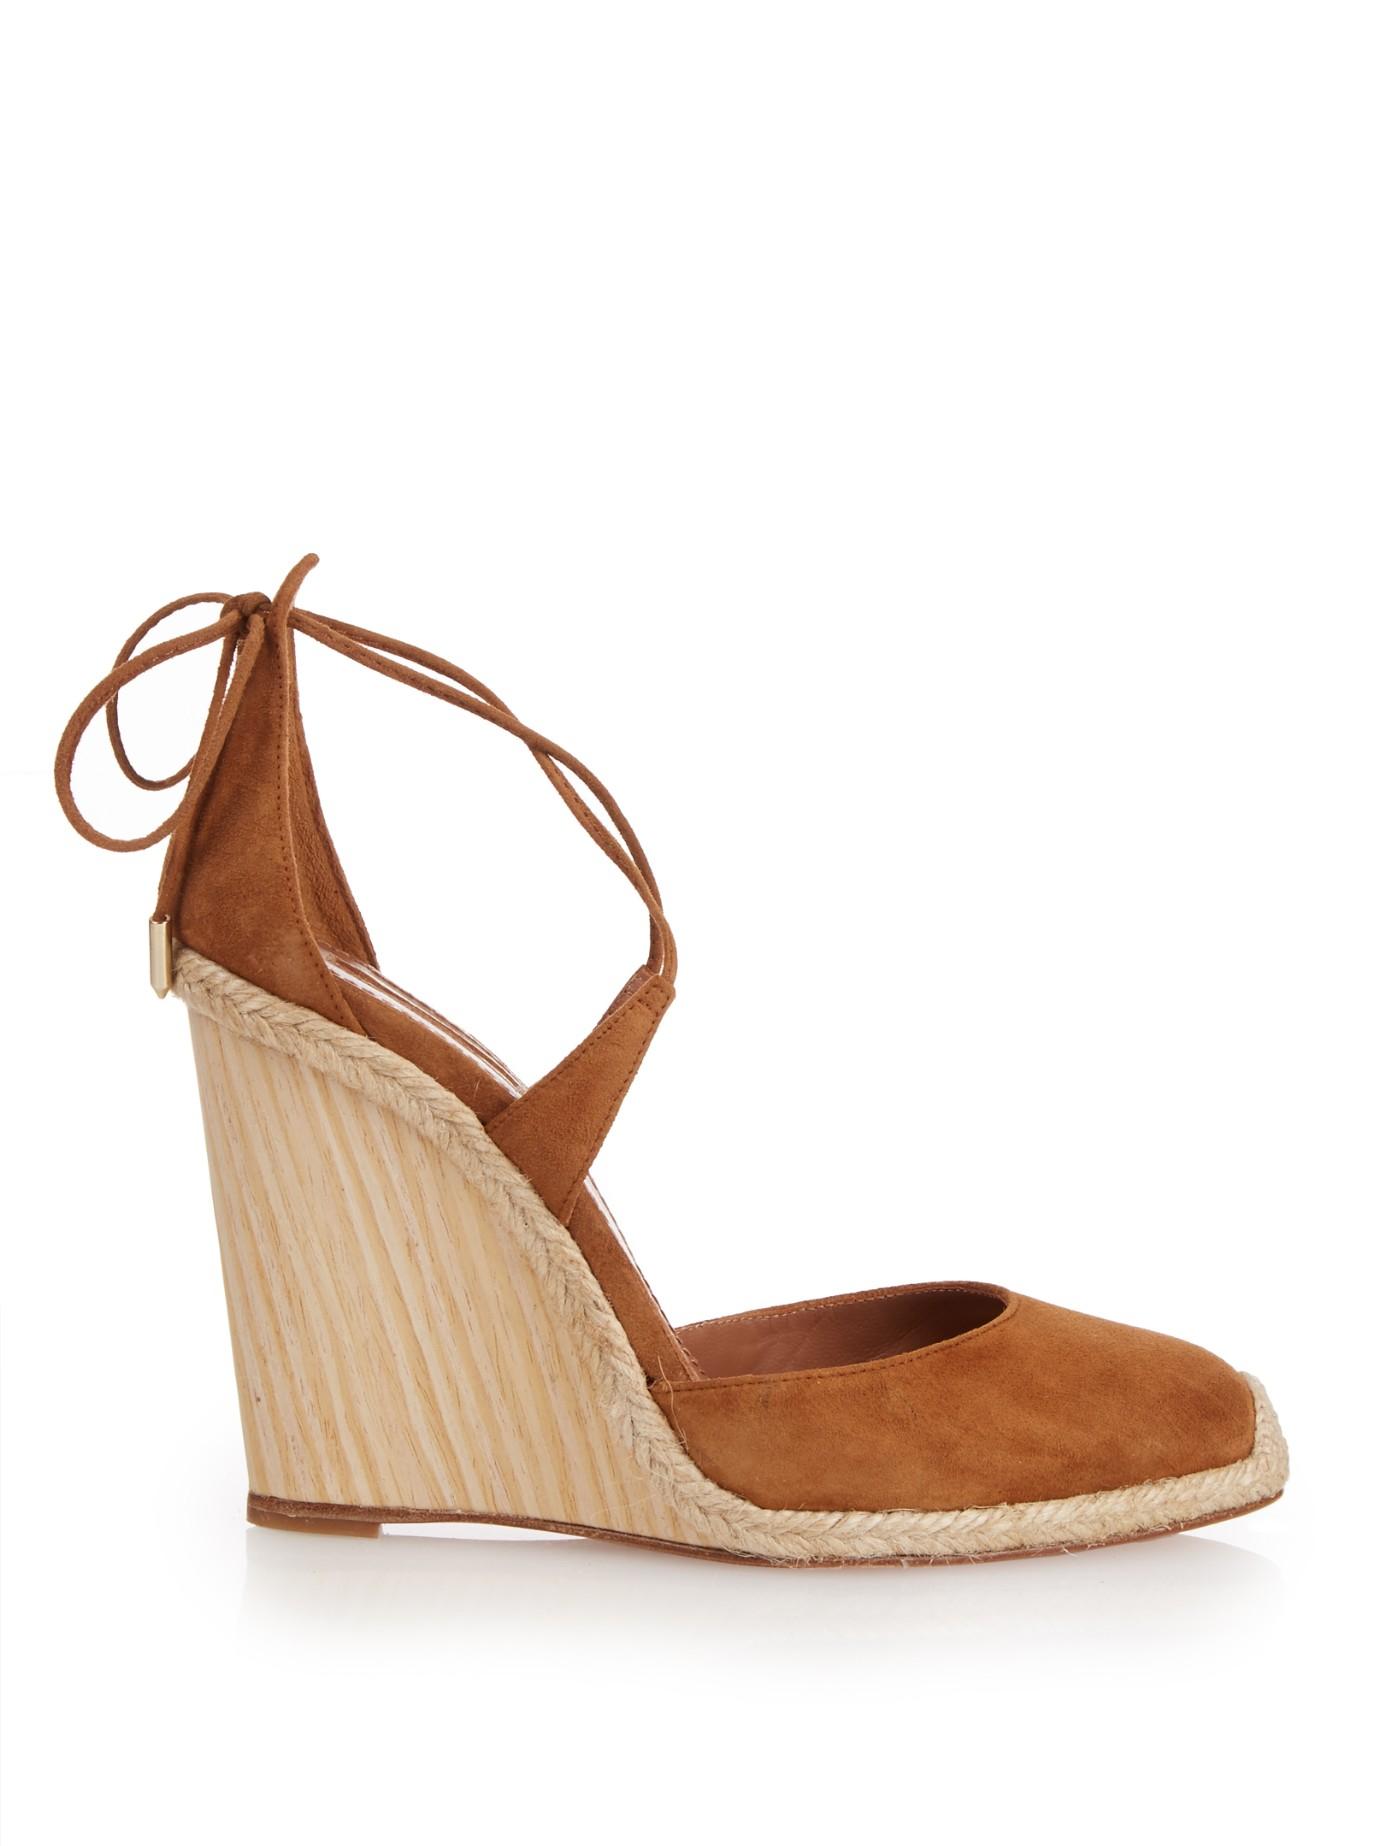 6b47171939c Lyst - Aquazzura Karlie Espadrille Wedge Sandals in Brown